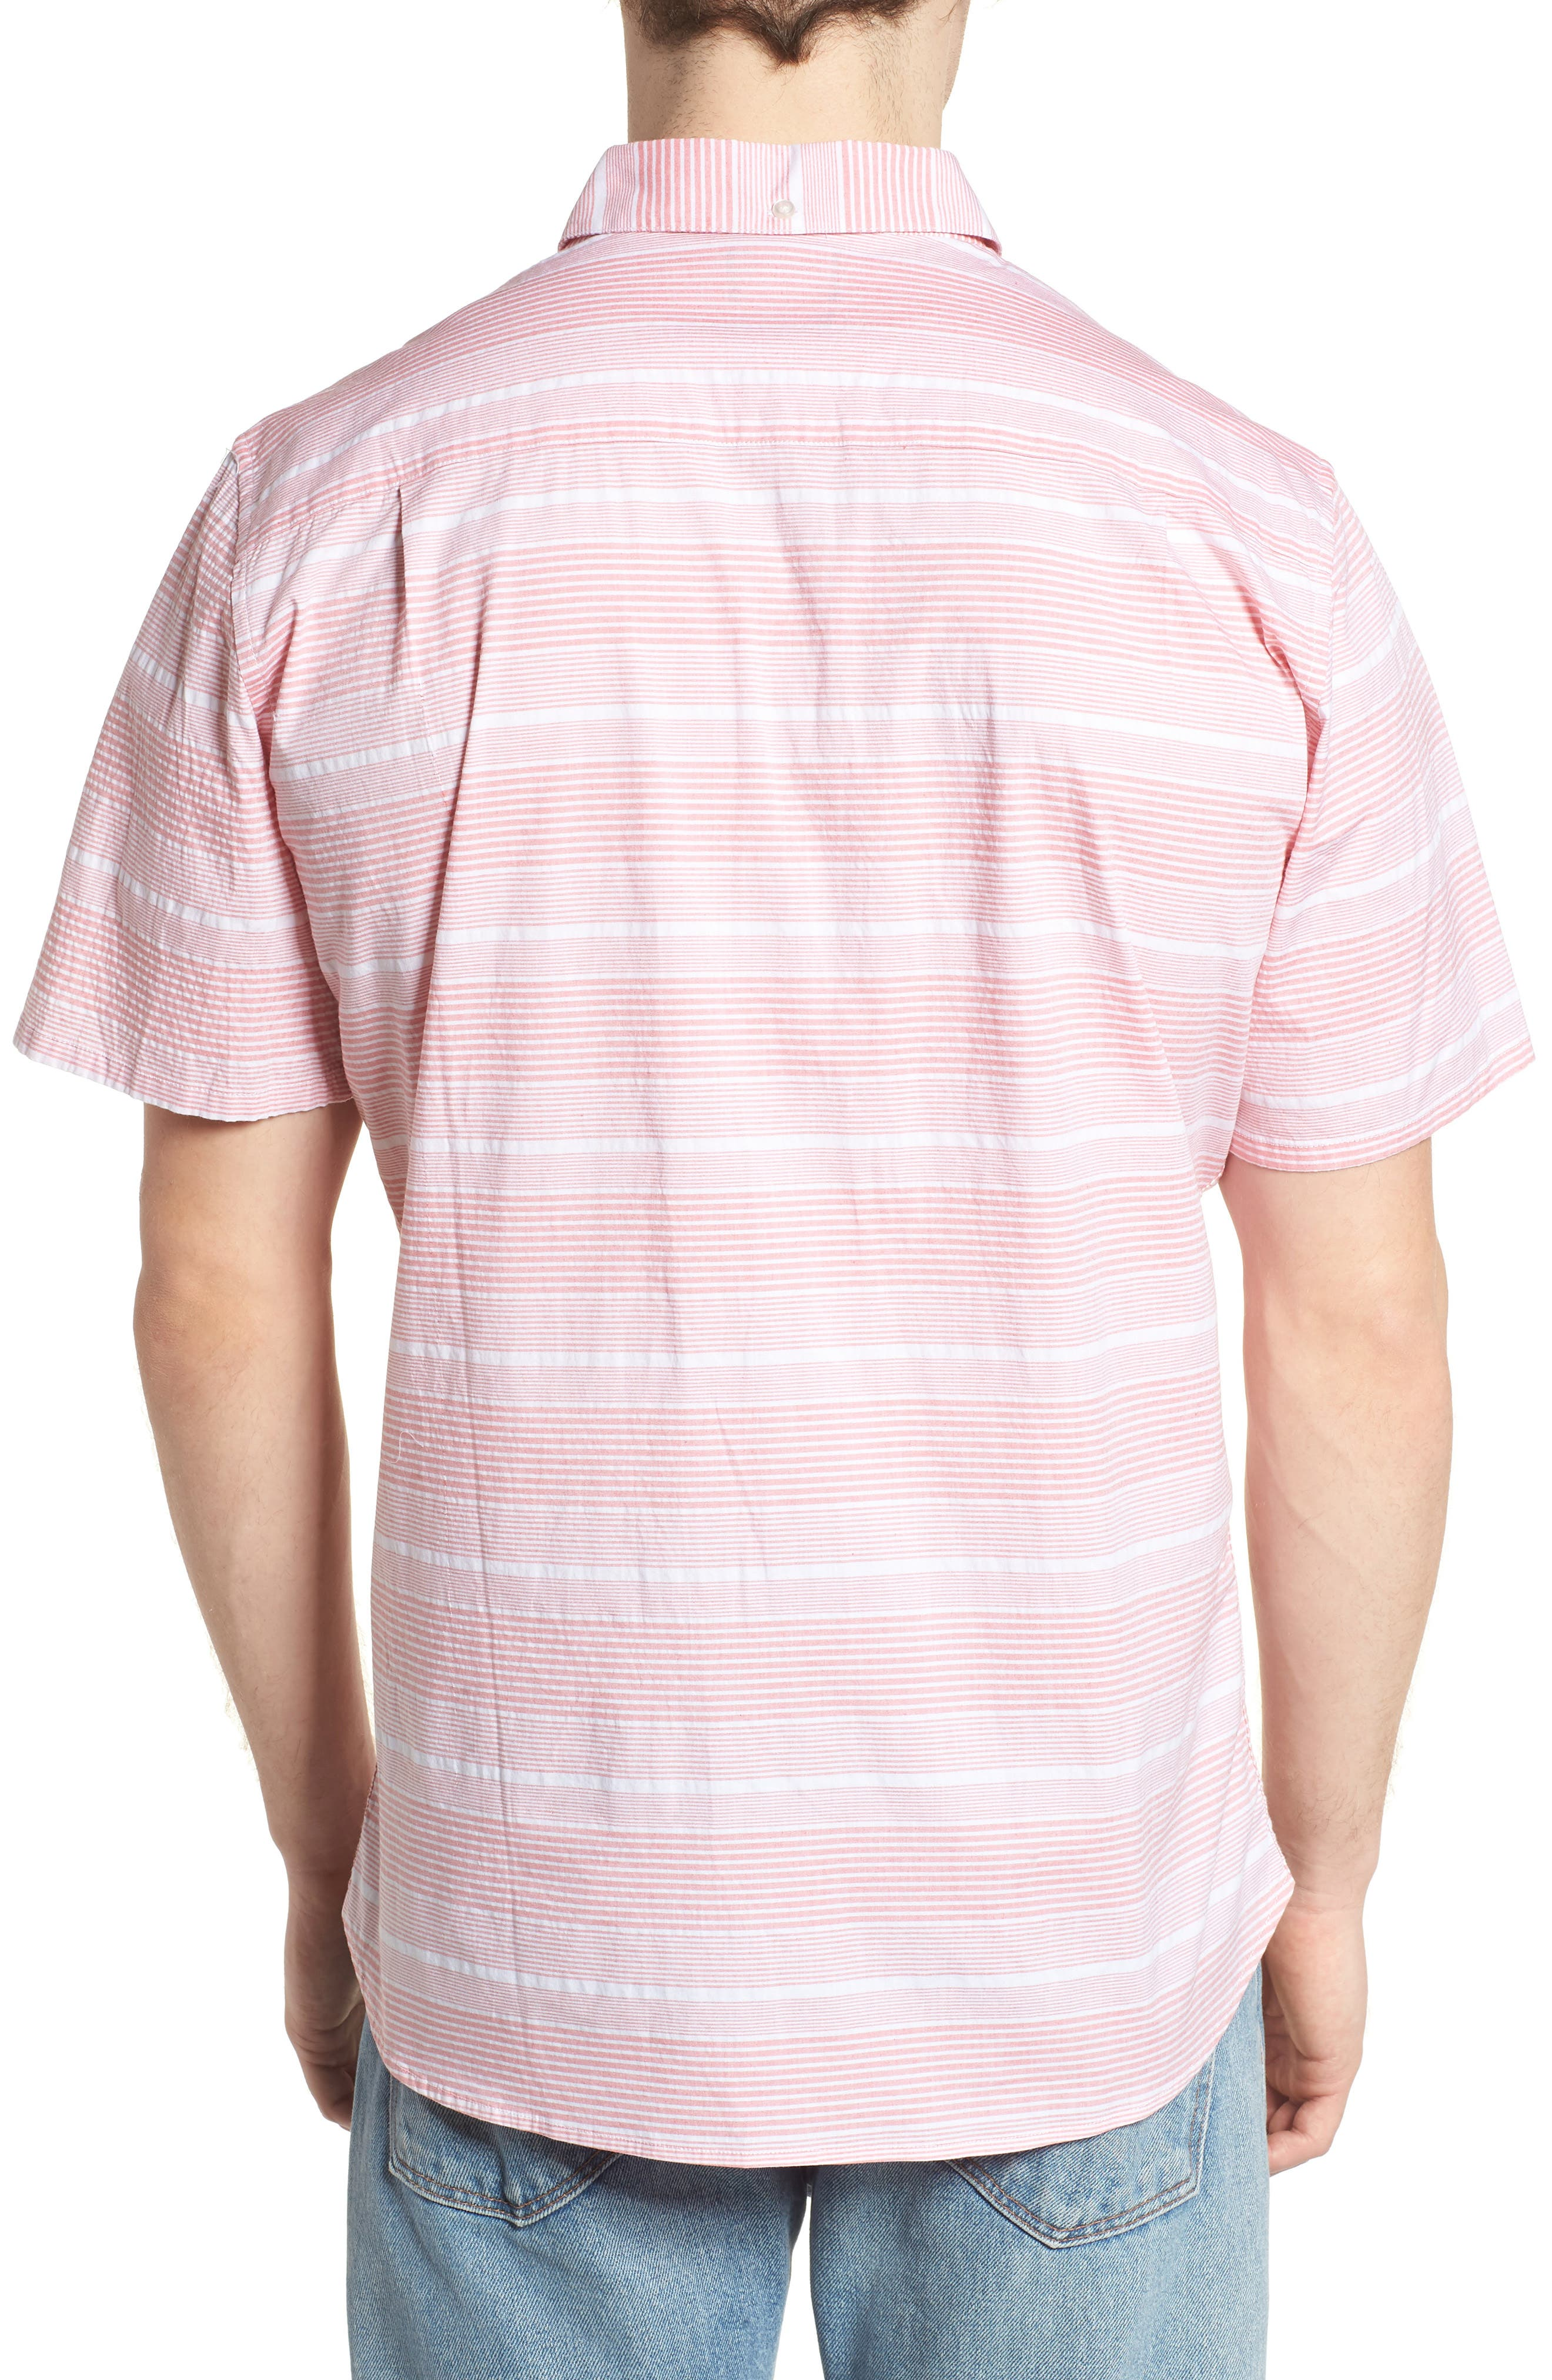 Surplus Short Sleeve Shirt,                             Alternate thumbnail 4, color,